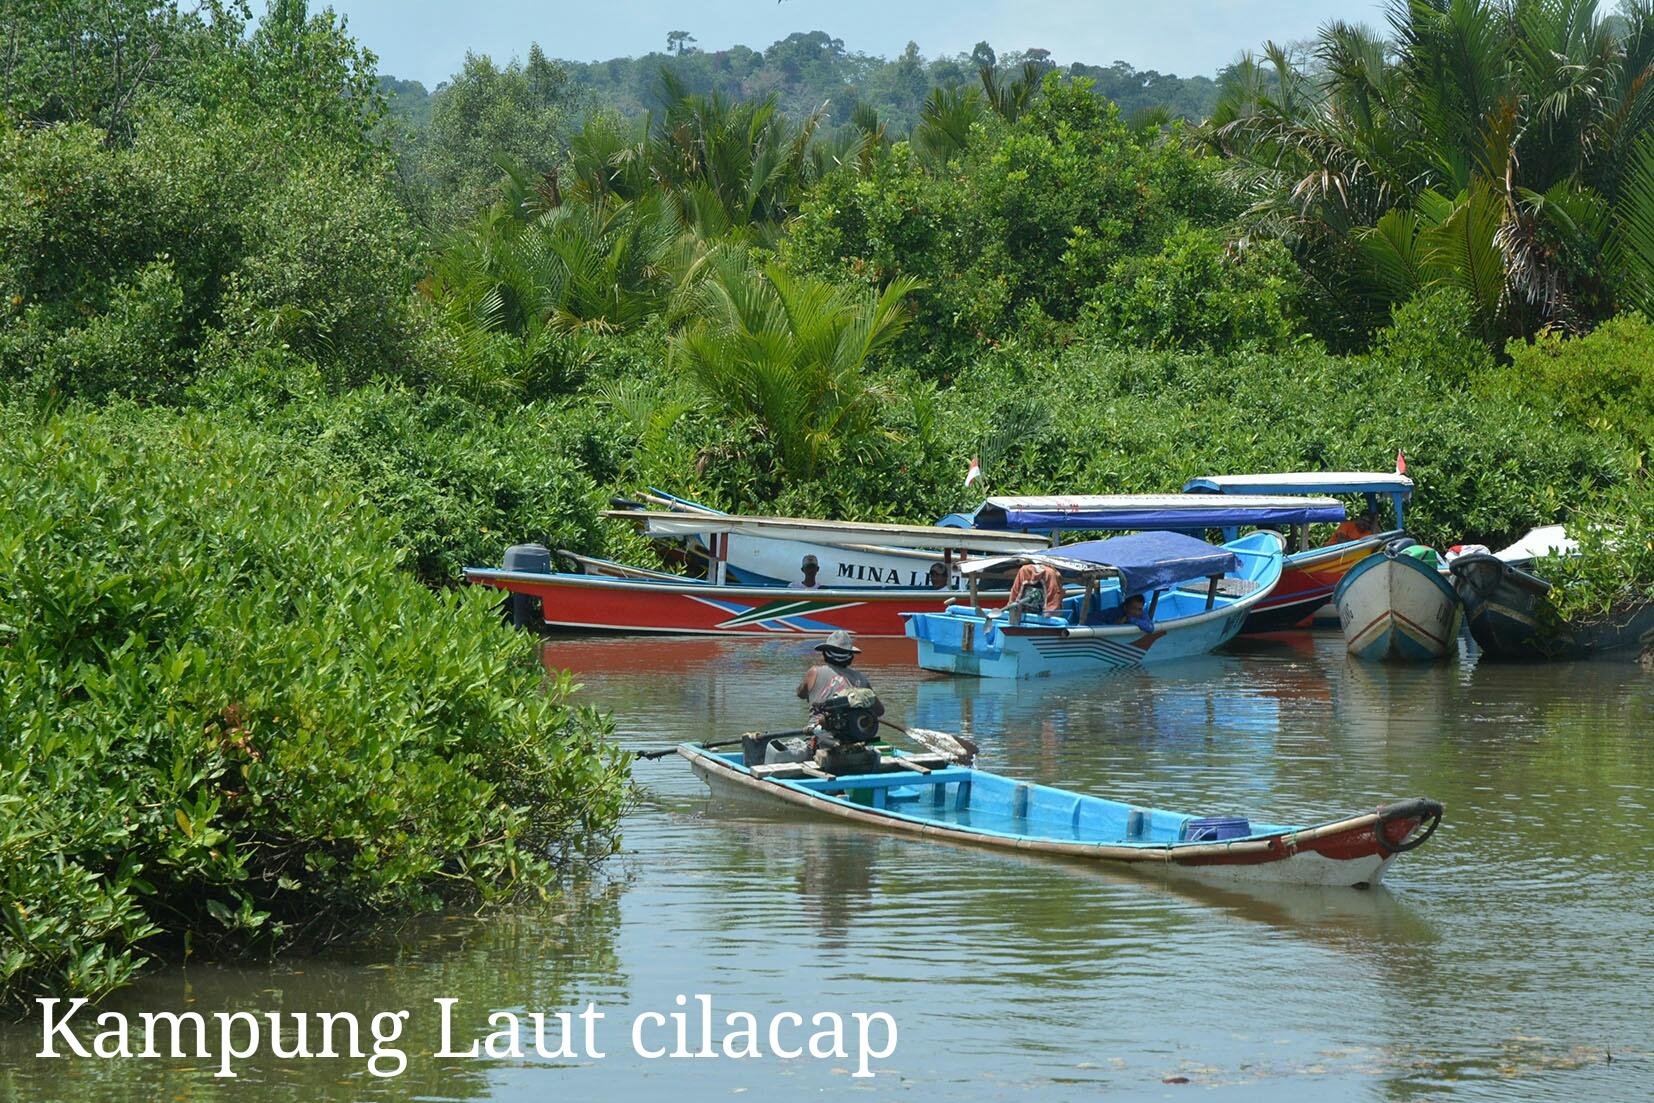 25 Objek Wisata Kabupaten Cilacap Jawa Tengah Terpopuler Jelajah Kampung